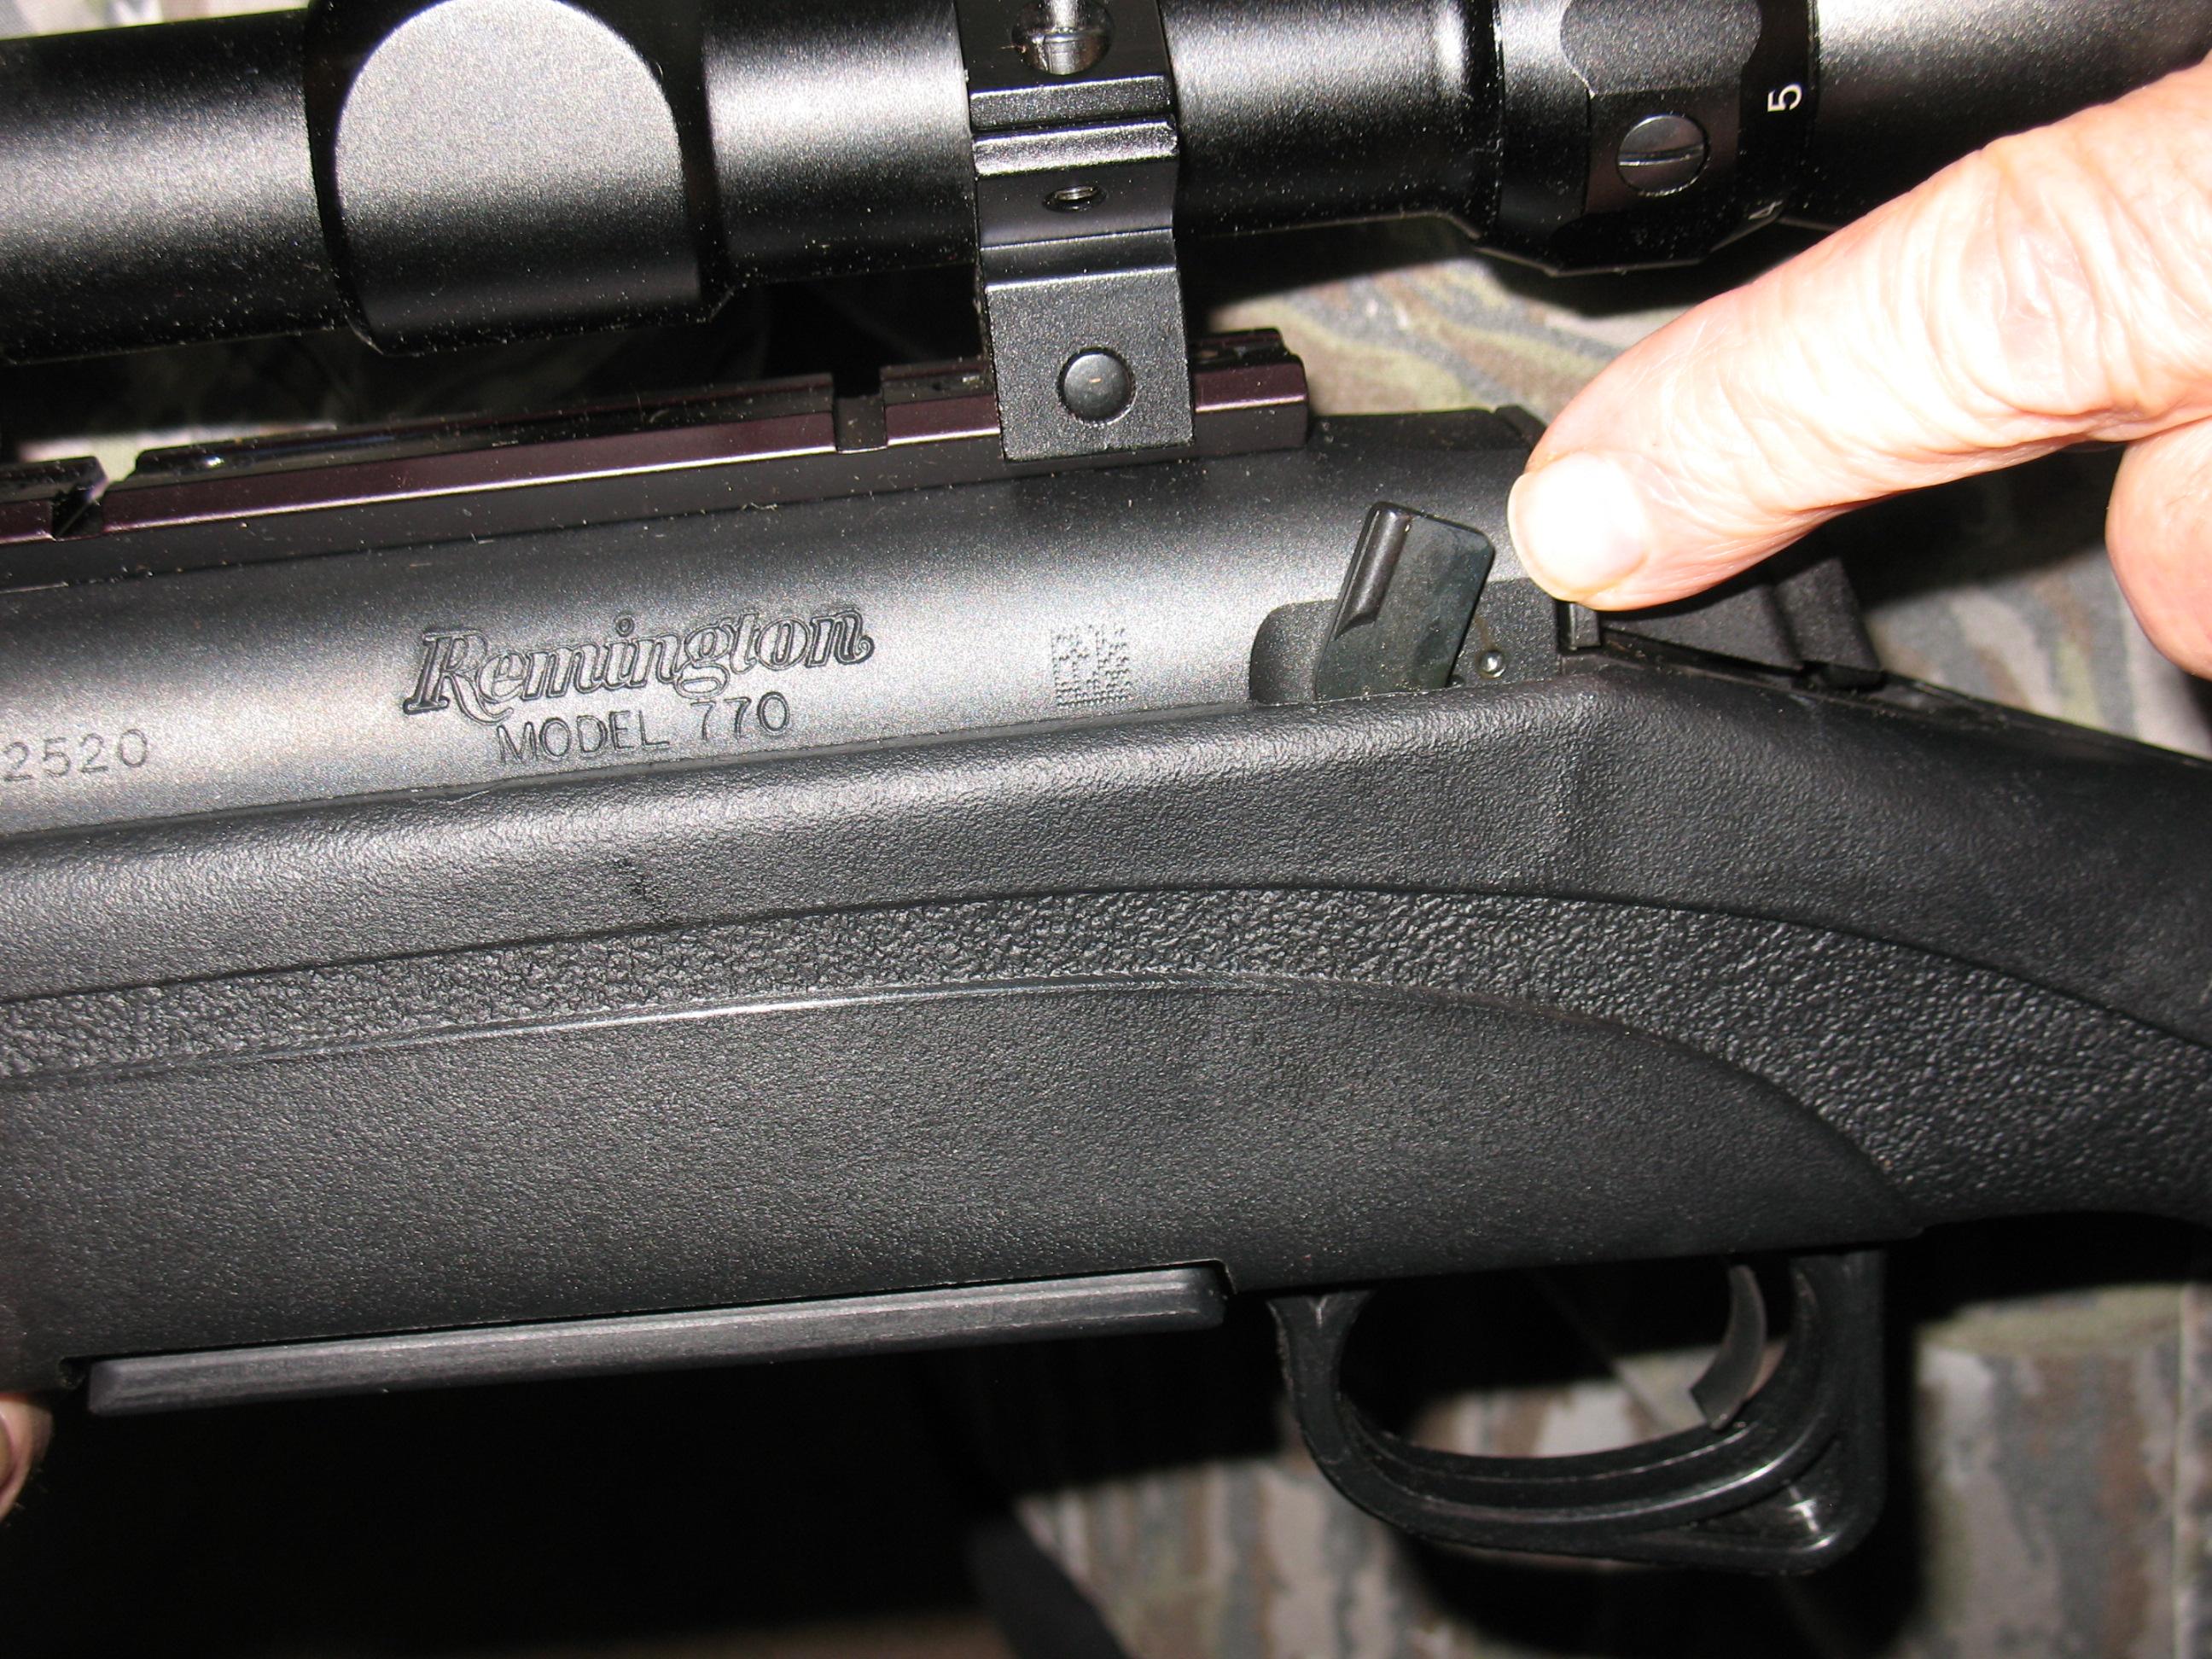 Remington 770 upgrades Large-Bore/Small-Bore Rifle/Shotgun. . hands on ... bonuscode 365 bet365 konto gesperrt nach einzahlung